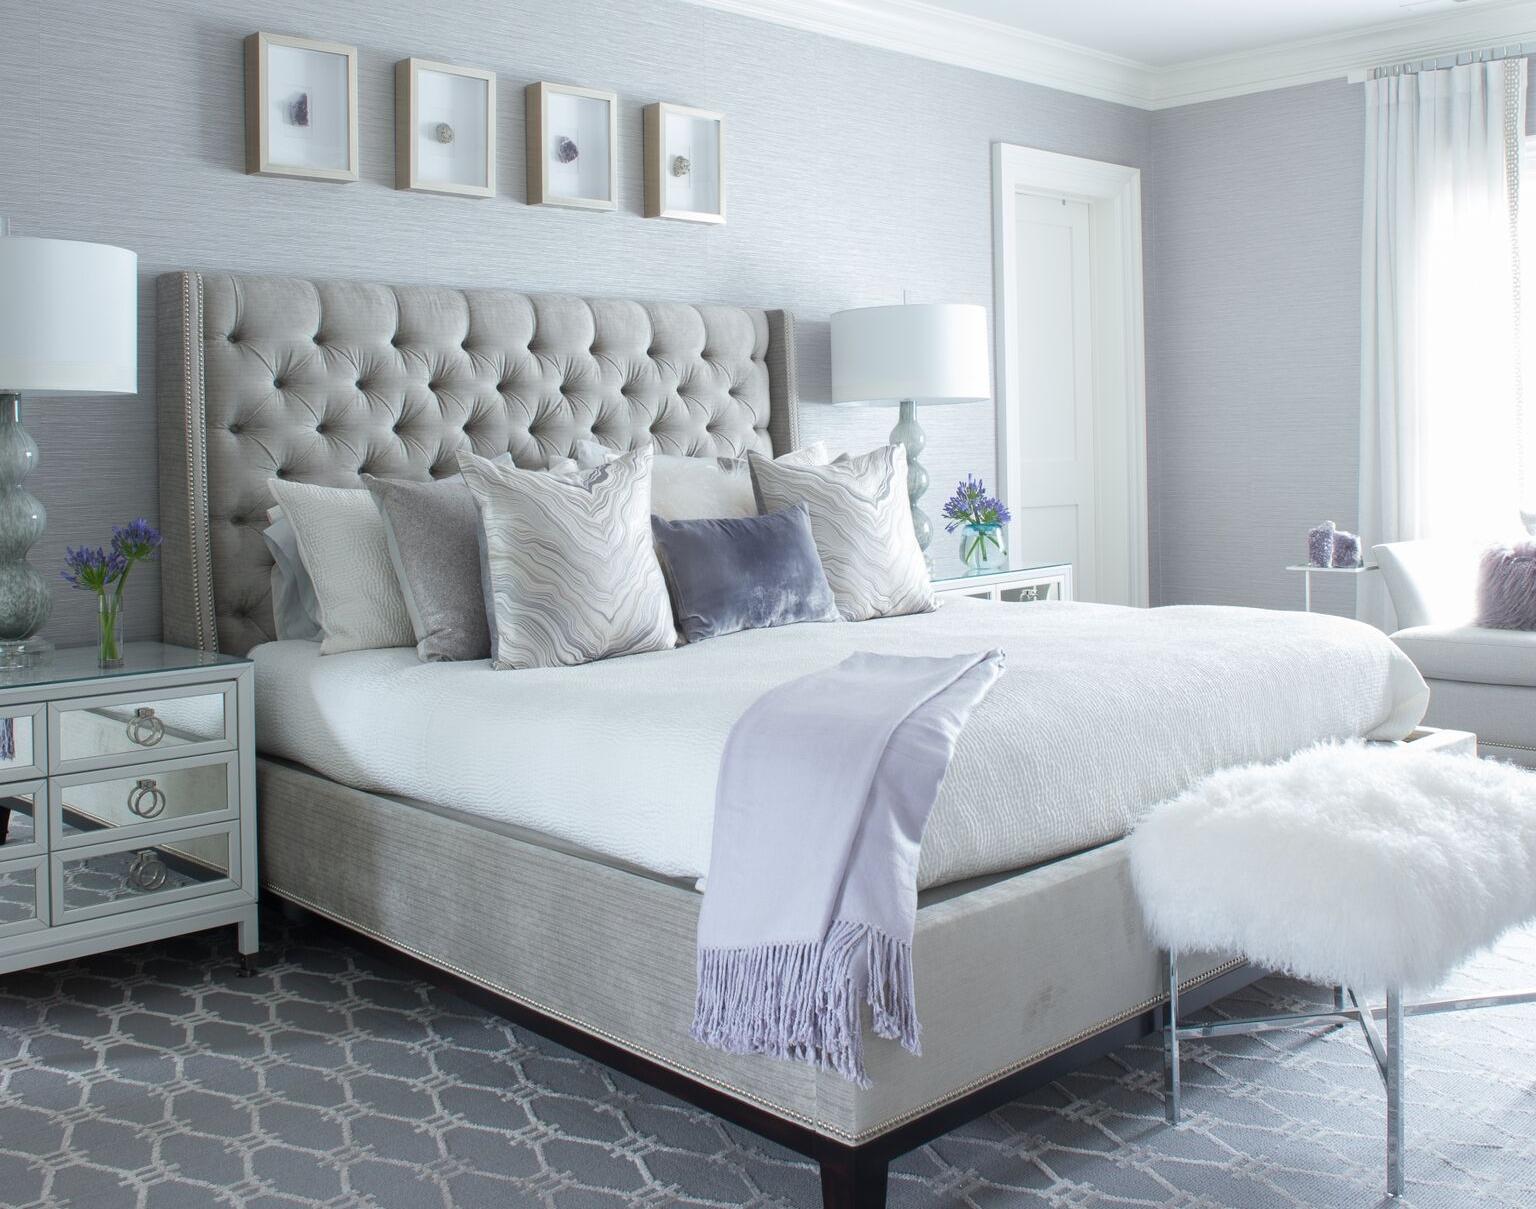 3. STEAM THE BED • Interiors:  Susan Glick Interiors